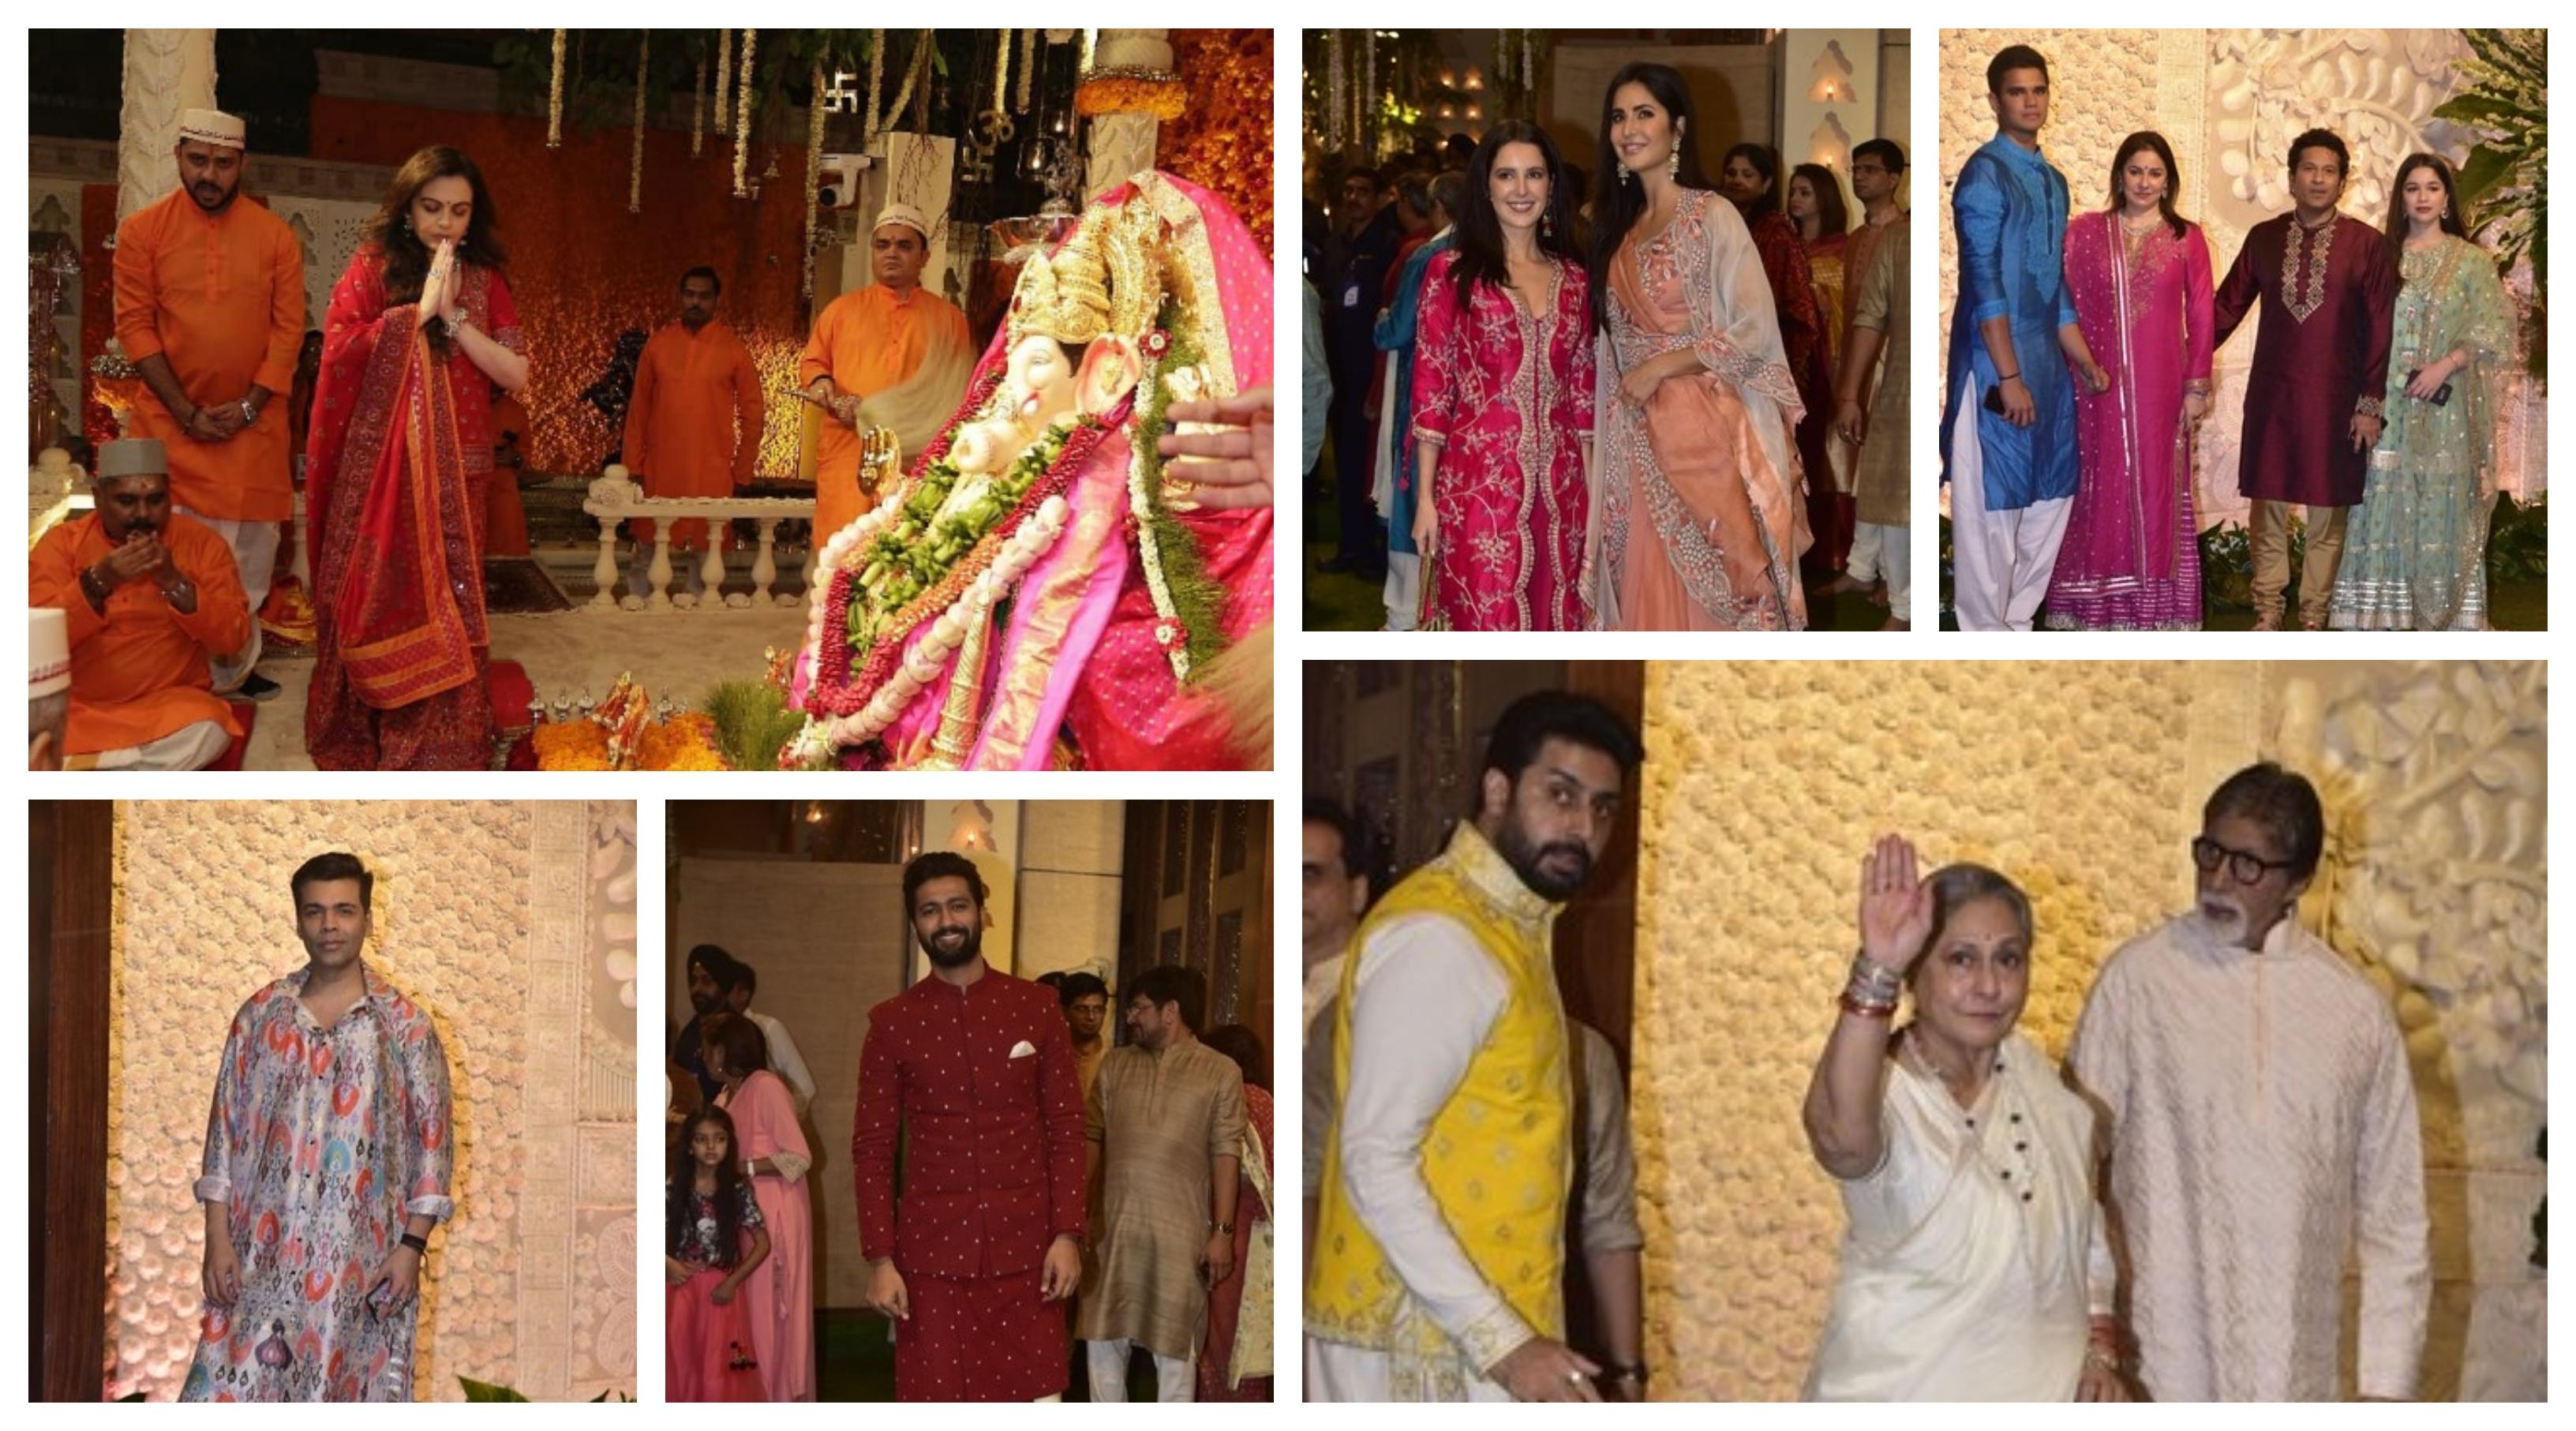 Bollywood celebrities at Ambani's ganpati celebration